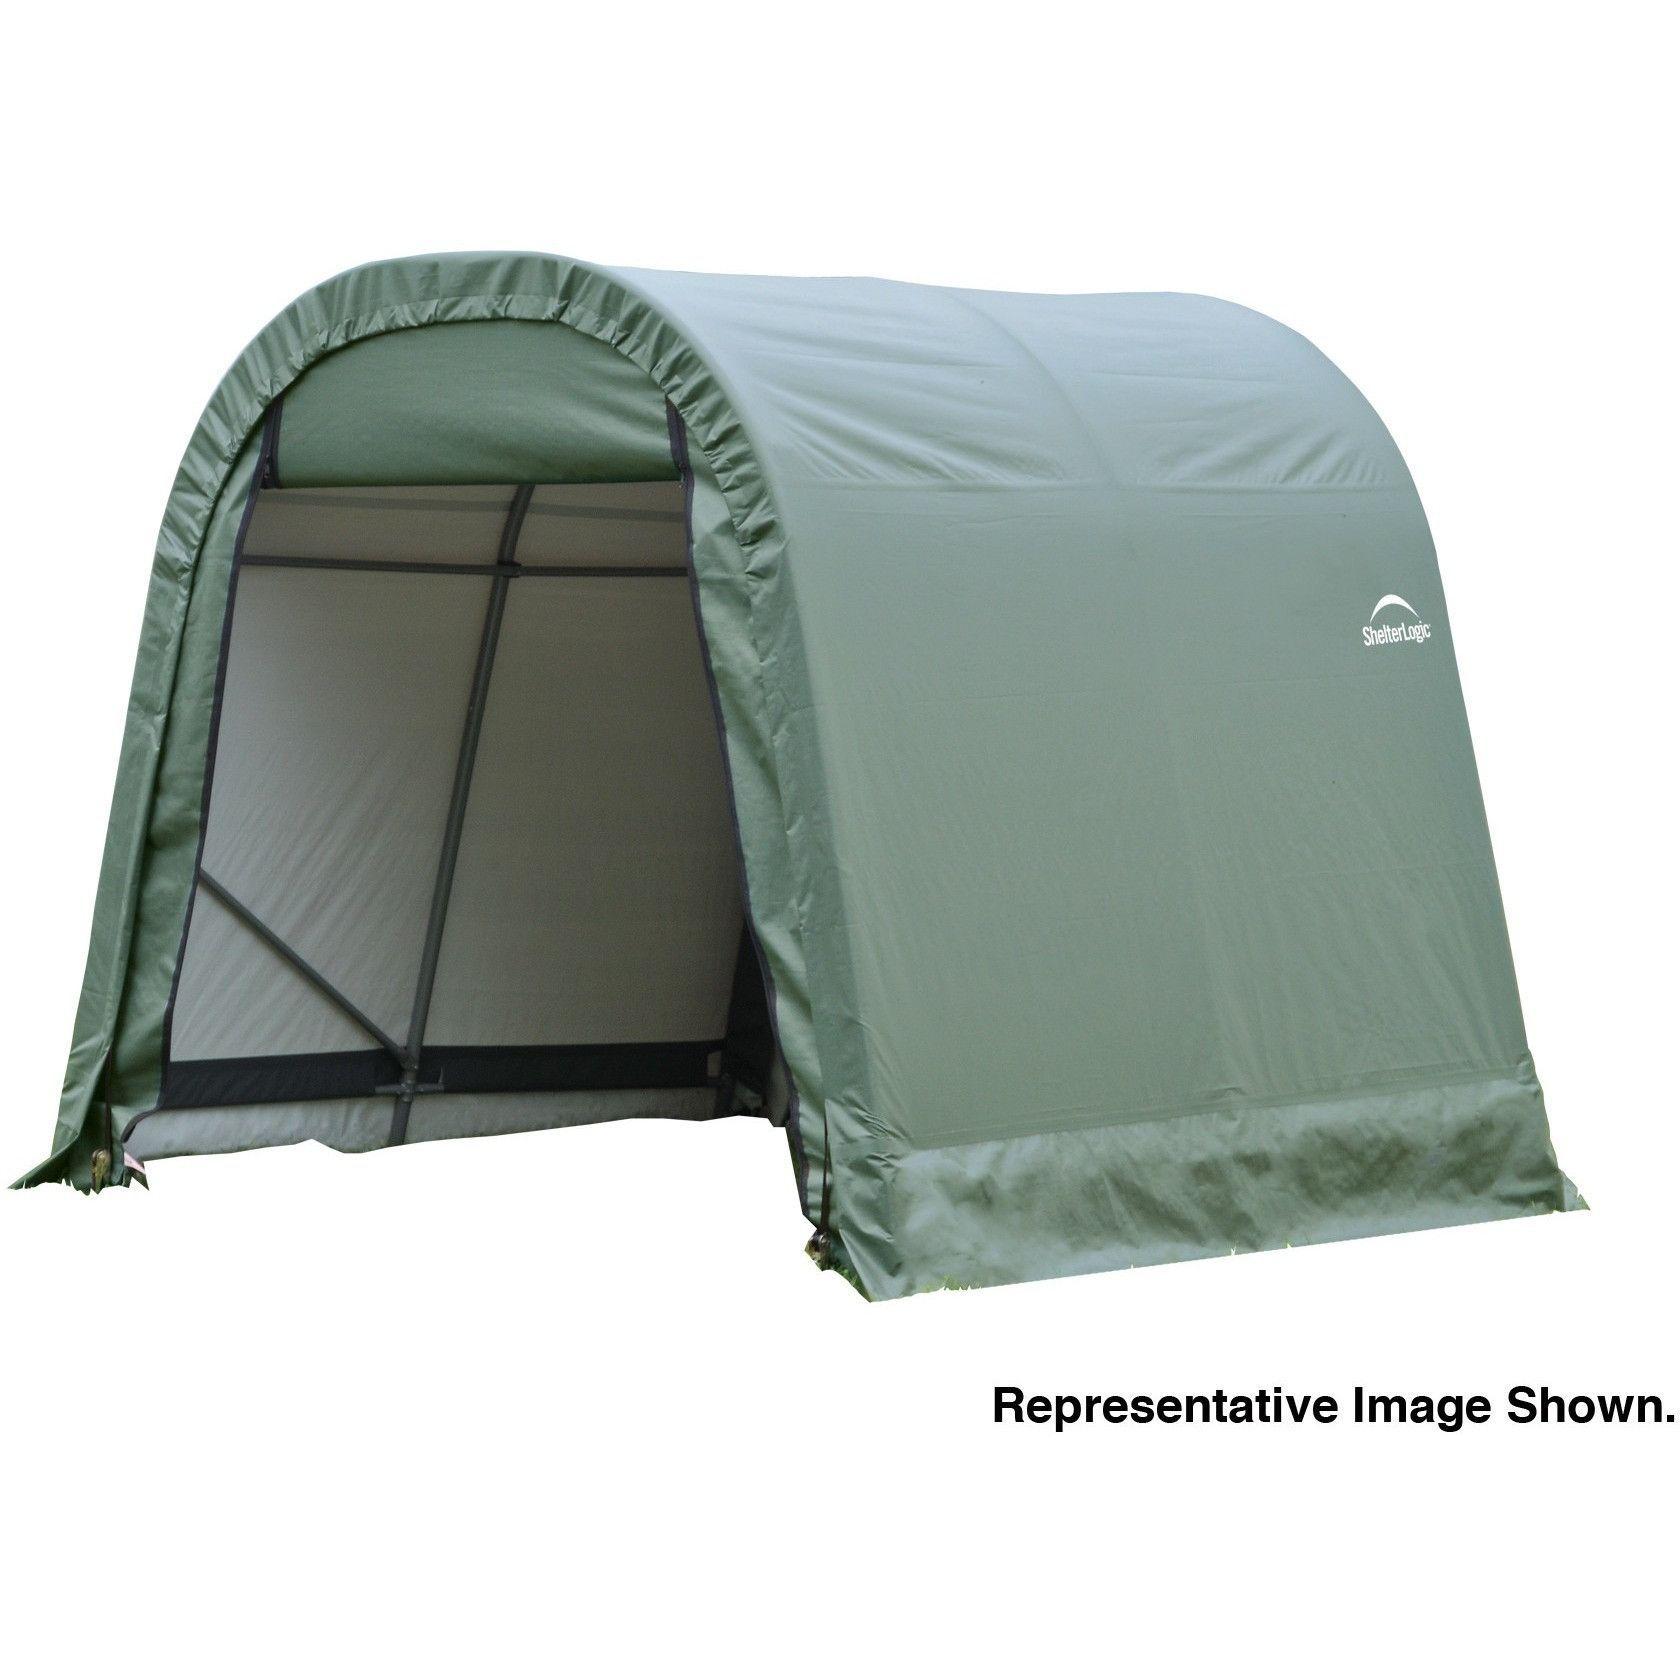 ShelterLogic GREEN SHELTERCOAT ROUND STD 10 X 16 X 8 77824